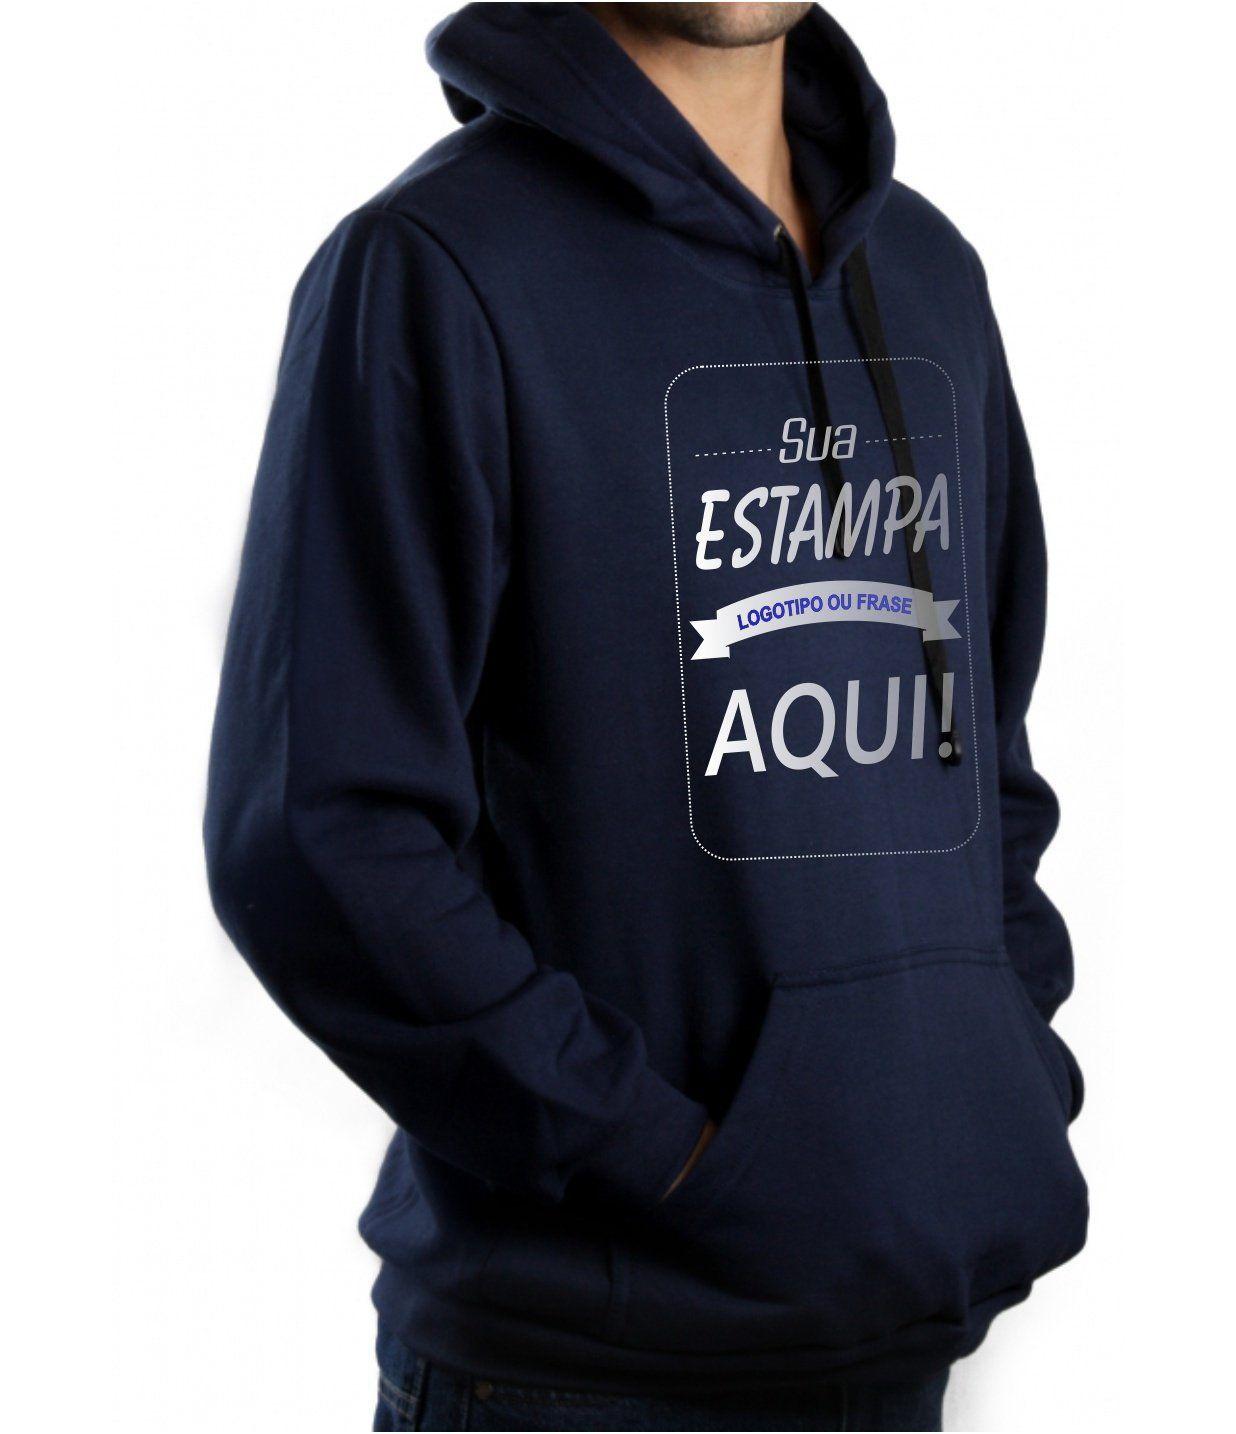 Blusa Moletom Masculina Canguru Personalizada Azul Marinho Estampa frente media (A4)